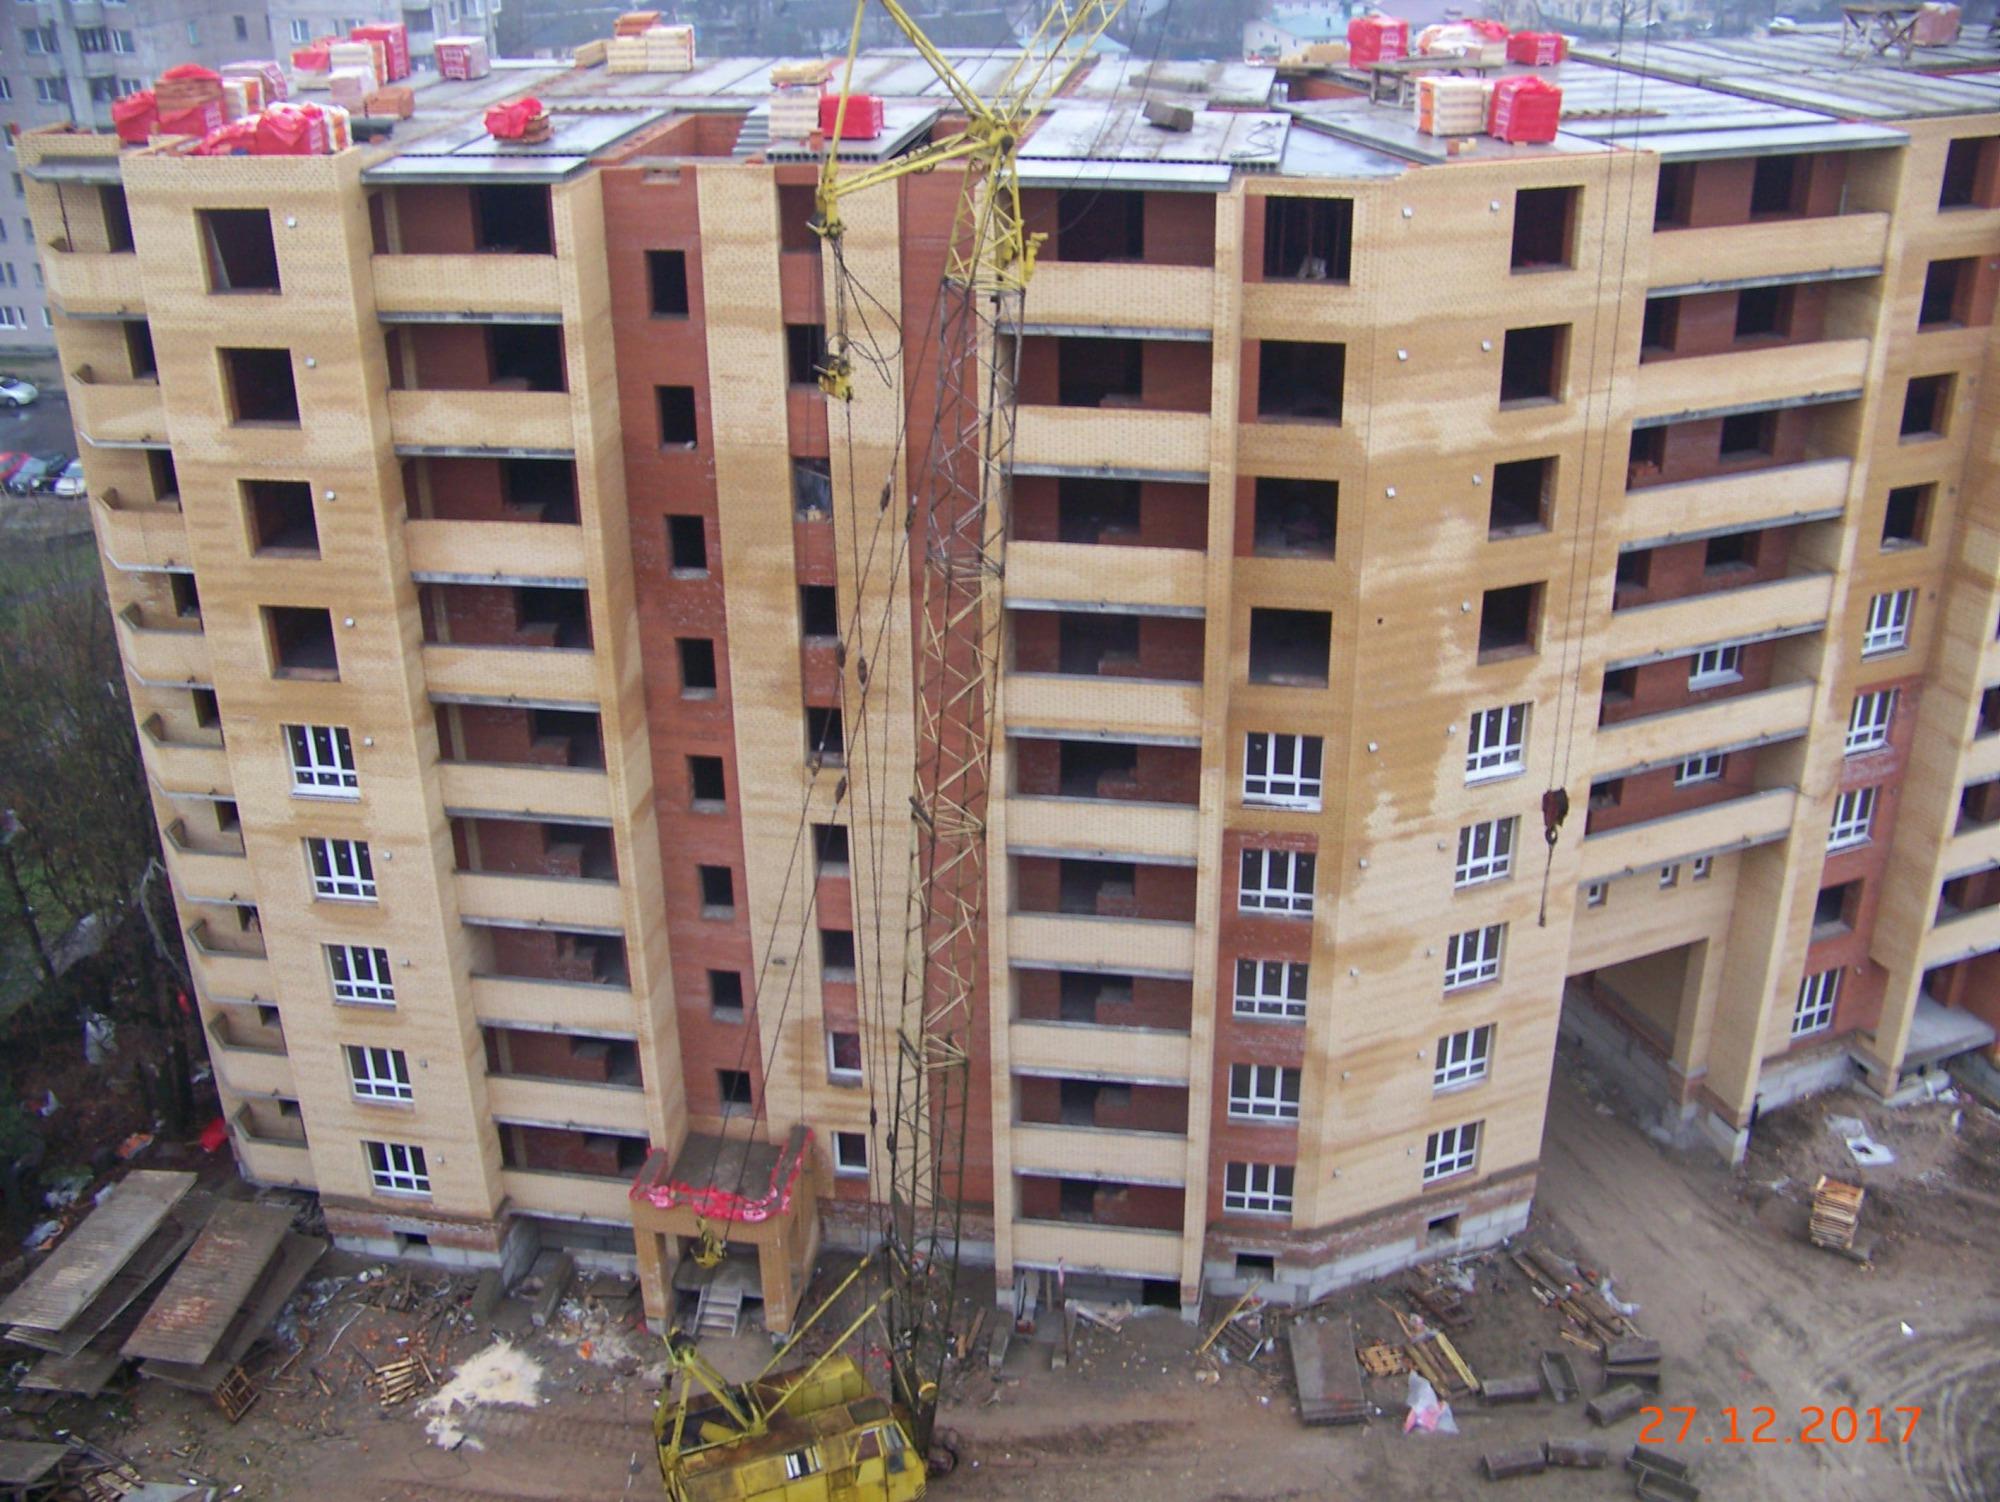 Двухкомнатная квартира -  ул Юбилейная, д. 41 а, кв. 6